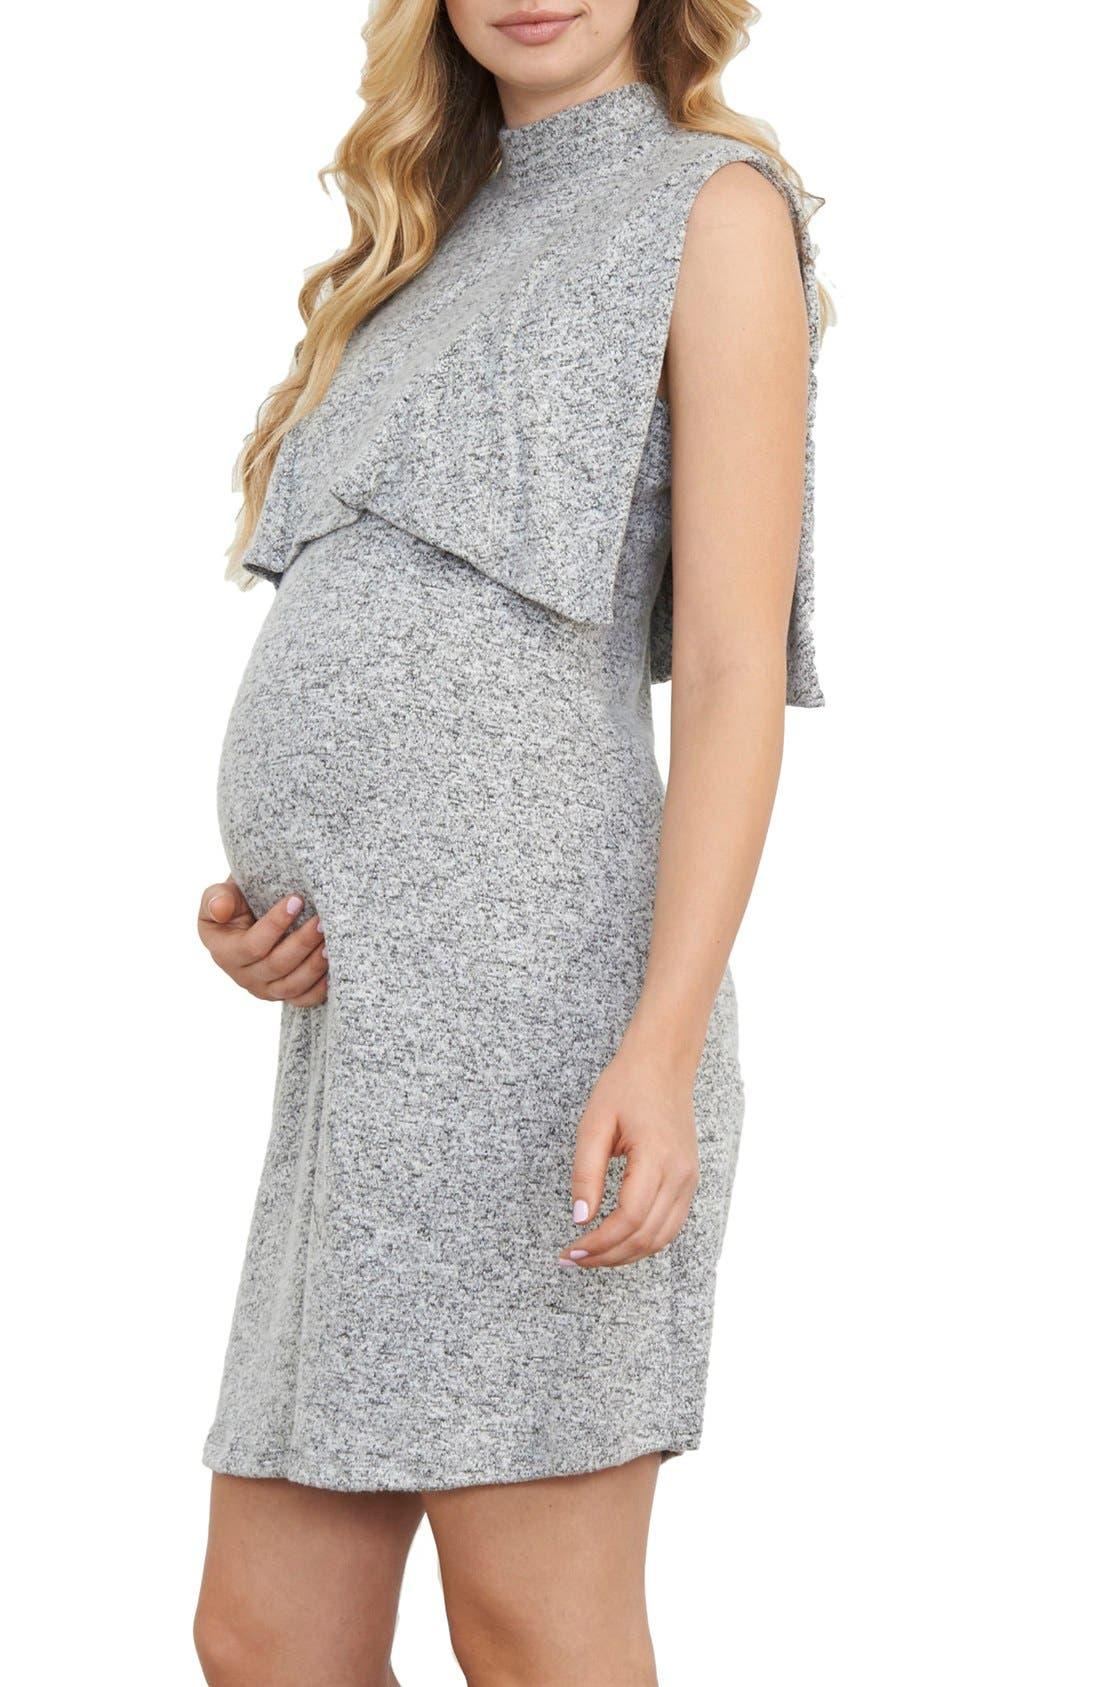 MATERNAL AMERICA, Sleeveless Maternity/Nursing Dress, Main thumbnail 1, color, GREY